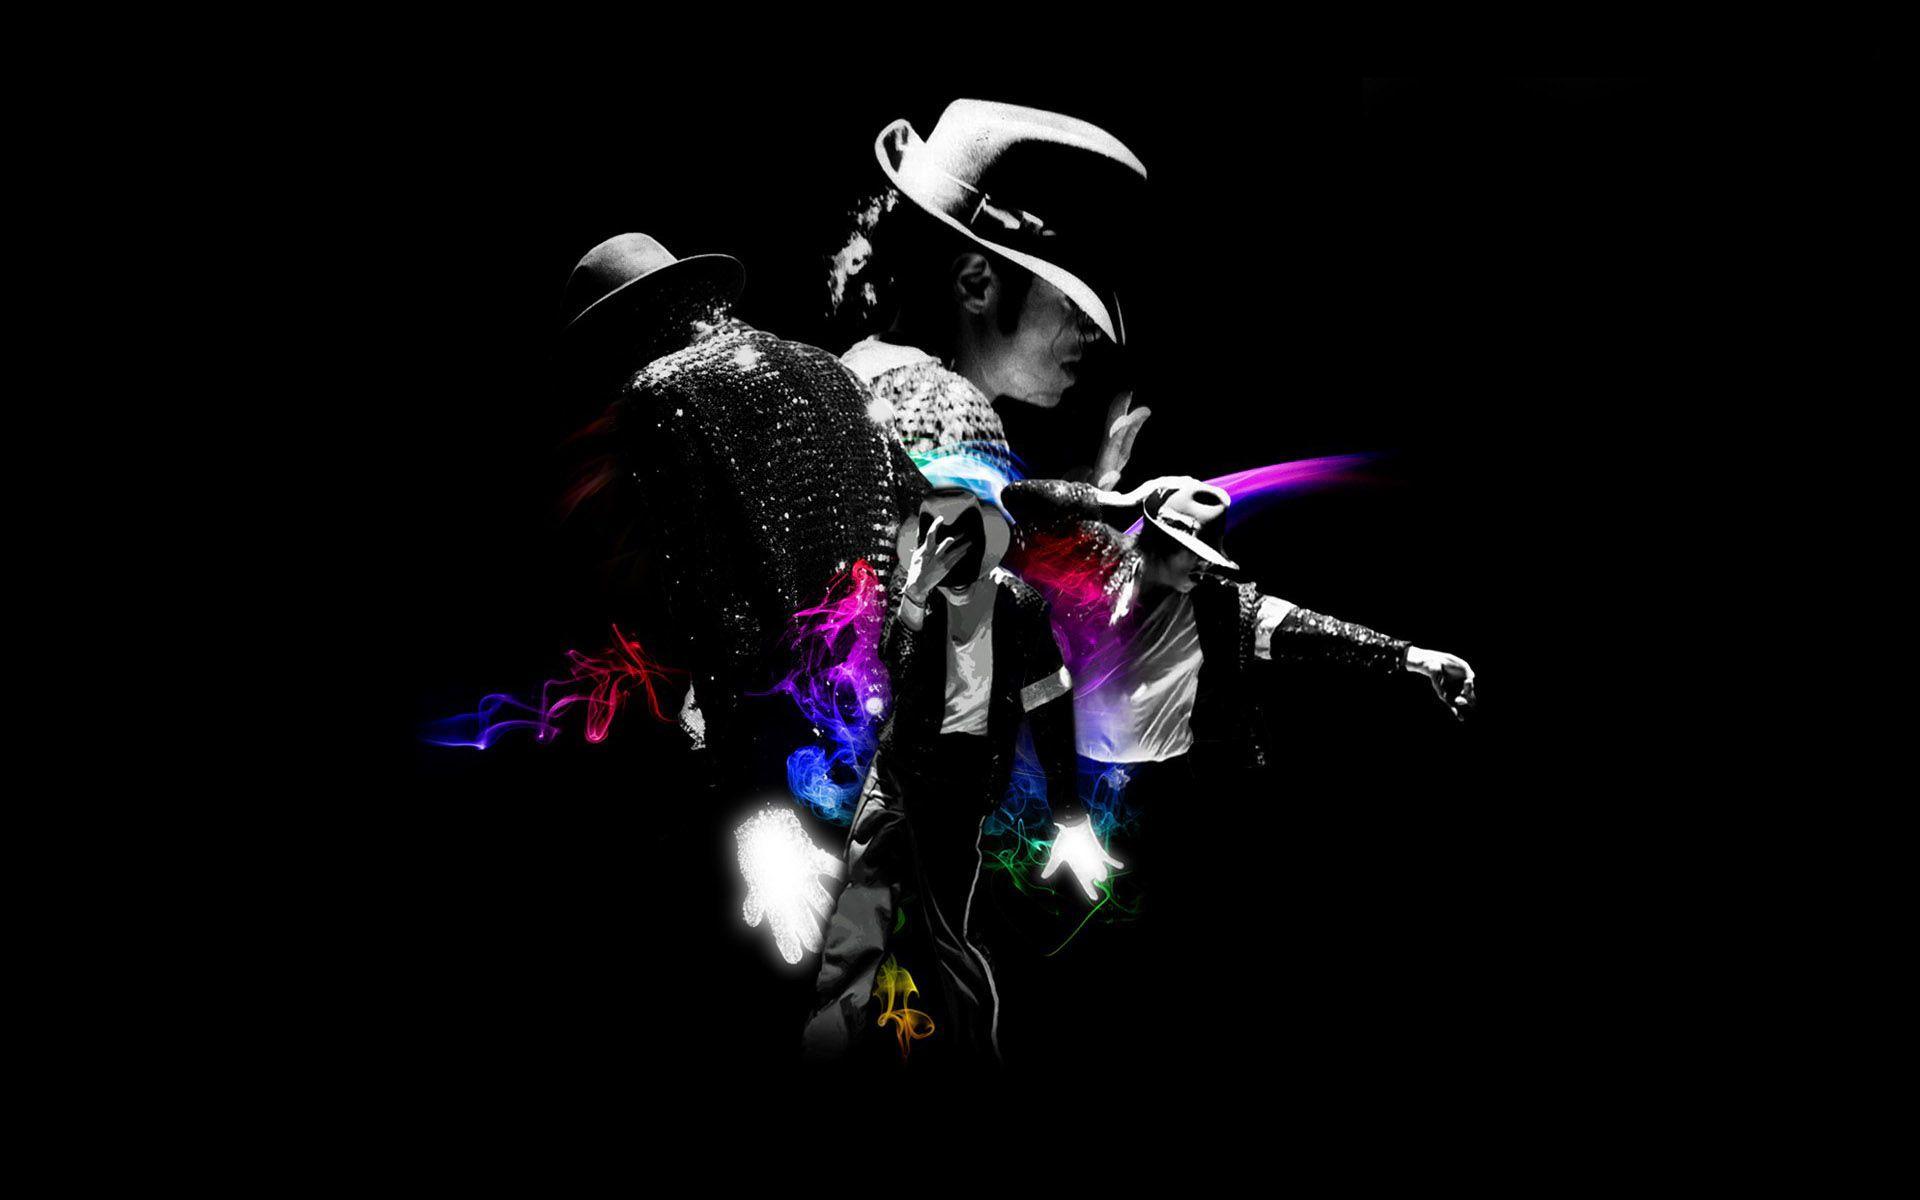 Michael Jackson Wallpaper Hd For Desktop Michael Jackson Wallpaper Michael Jackson Images Michael Jackson